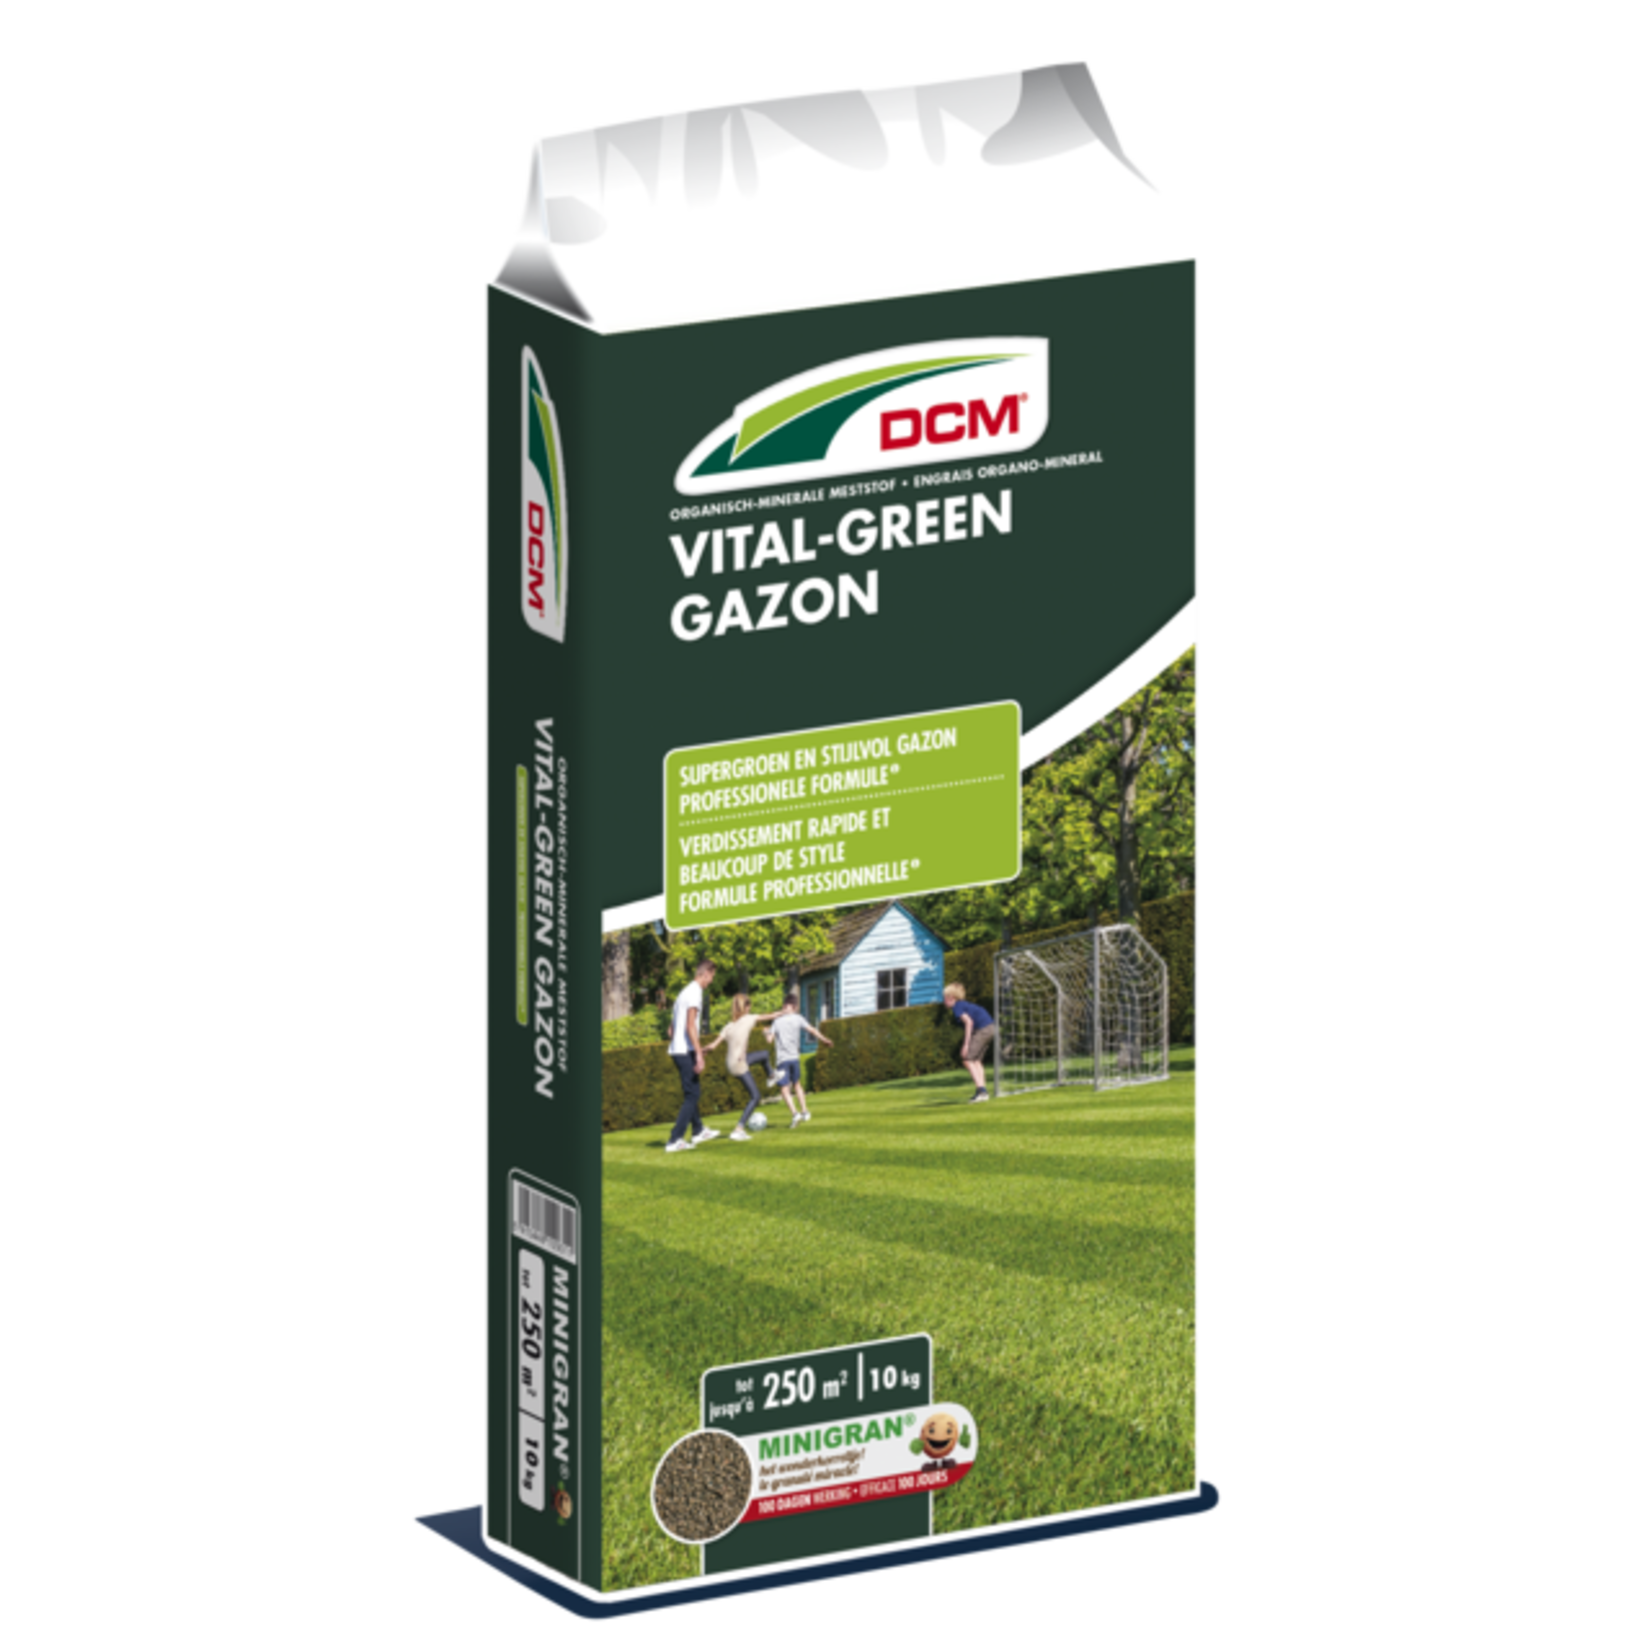 DCM Vital-Green gazon